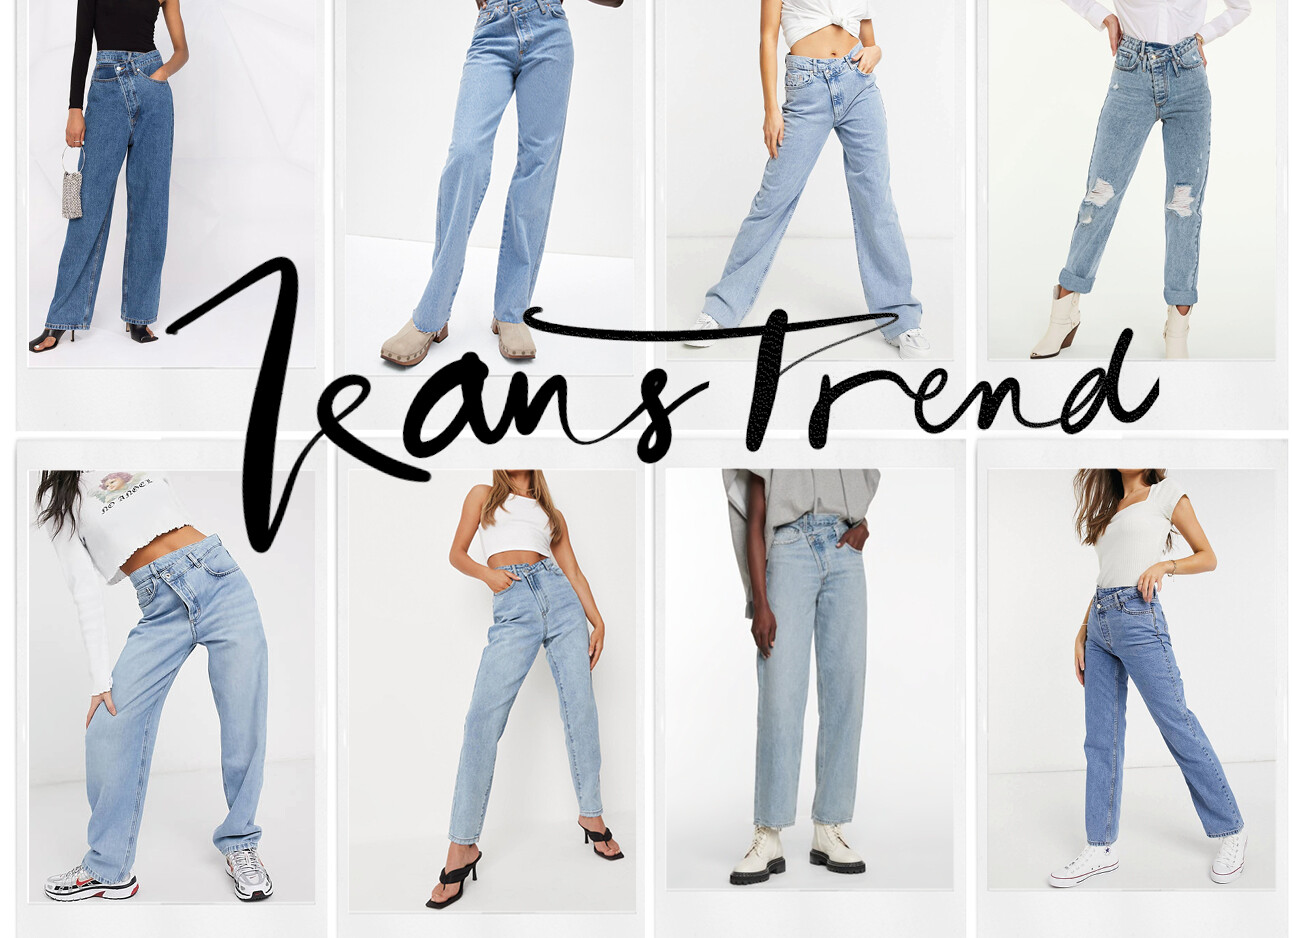 De criss-cross jeans trend